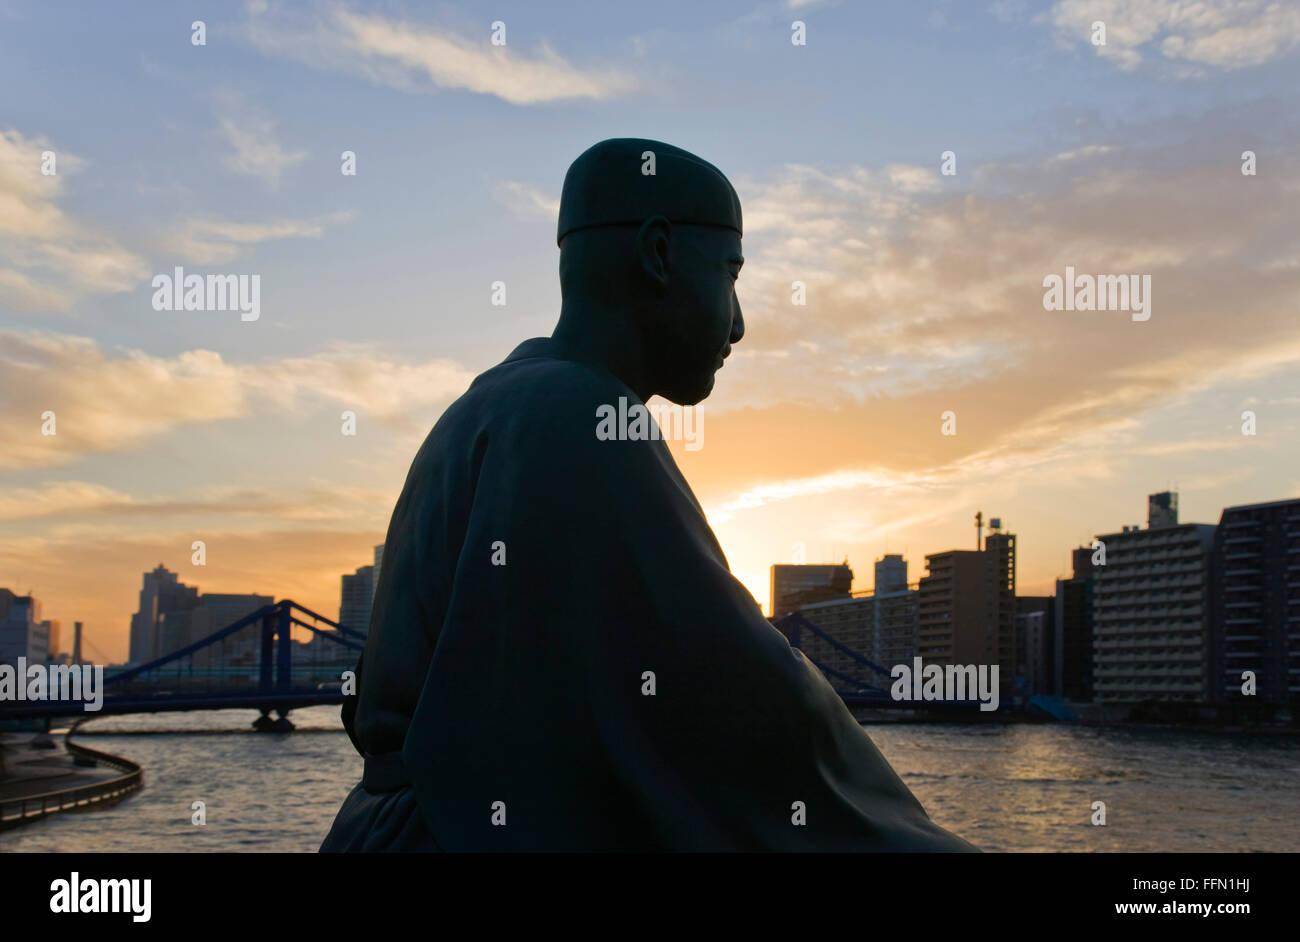 A statue of Matsuo Basho (Japan's most renowned haiku poet) overlooks the Sumida River and Kiyosubashi Bridge - Stock Image